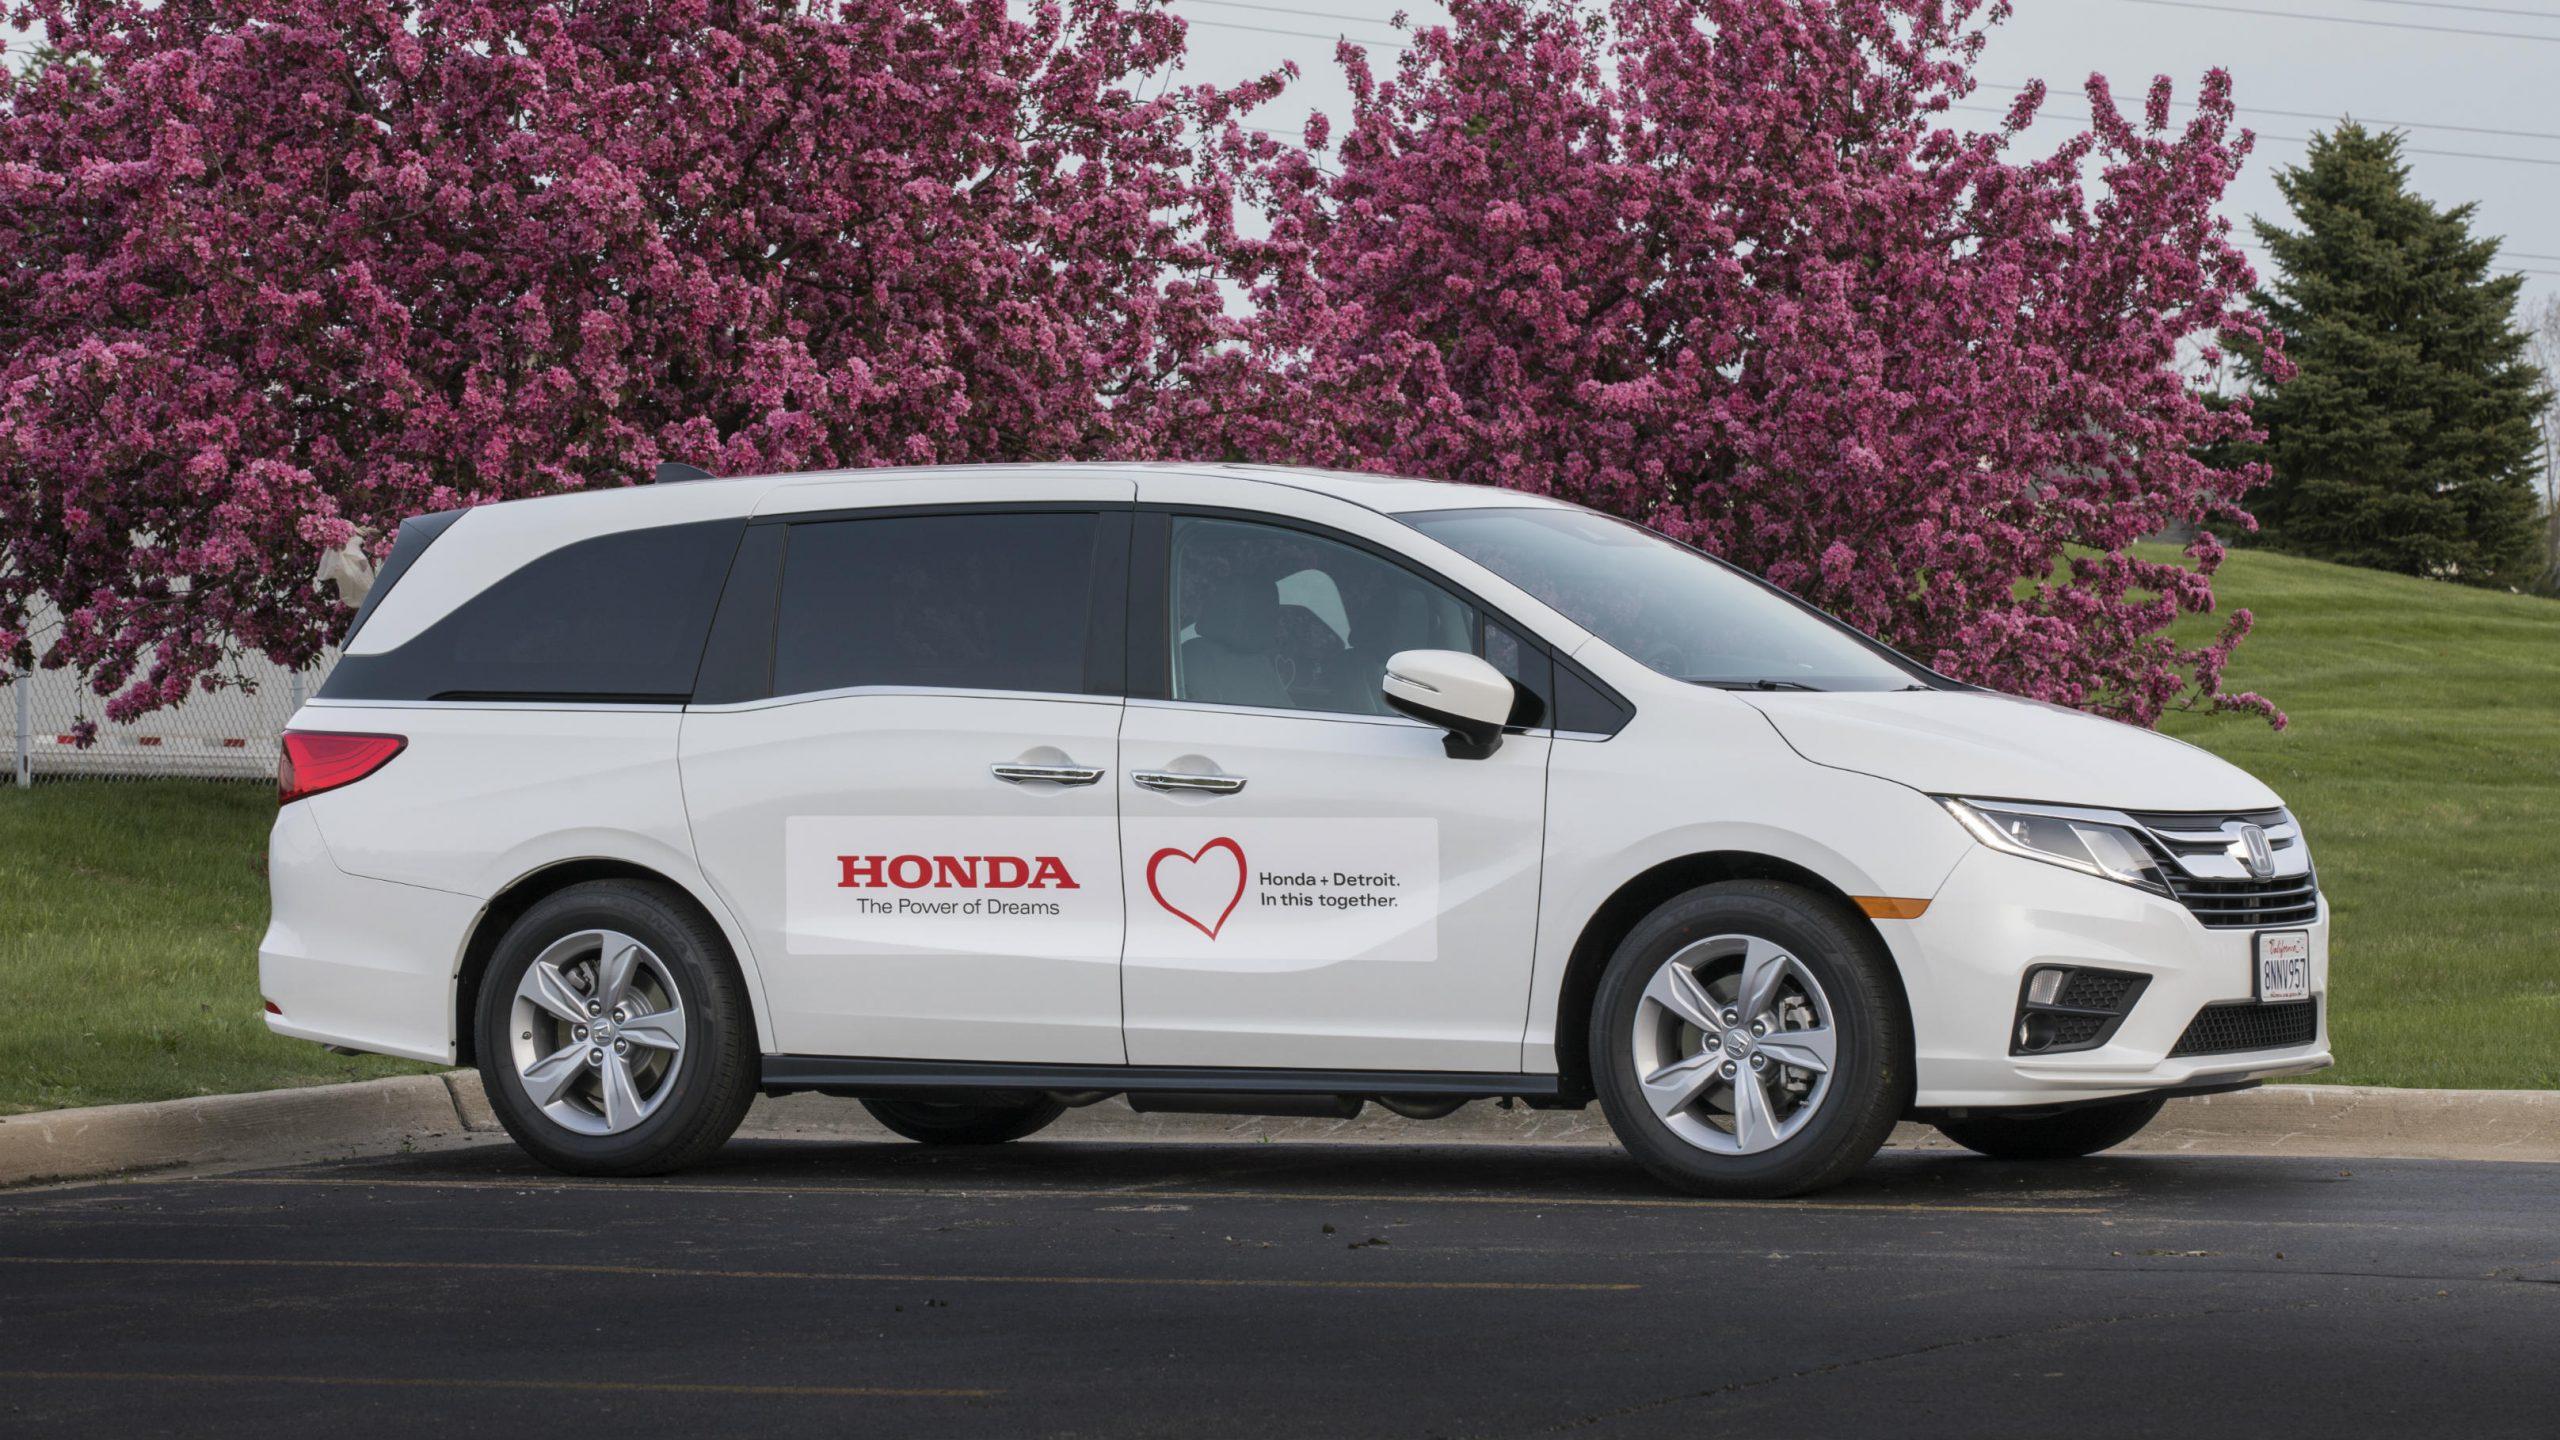 Honda Modifies Minivan